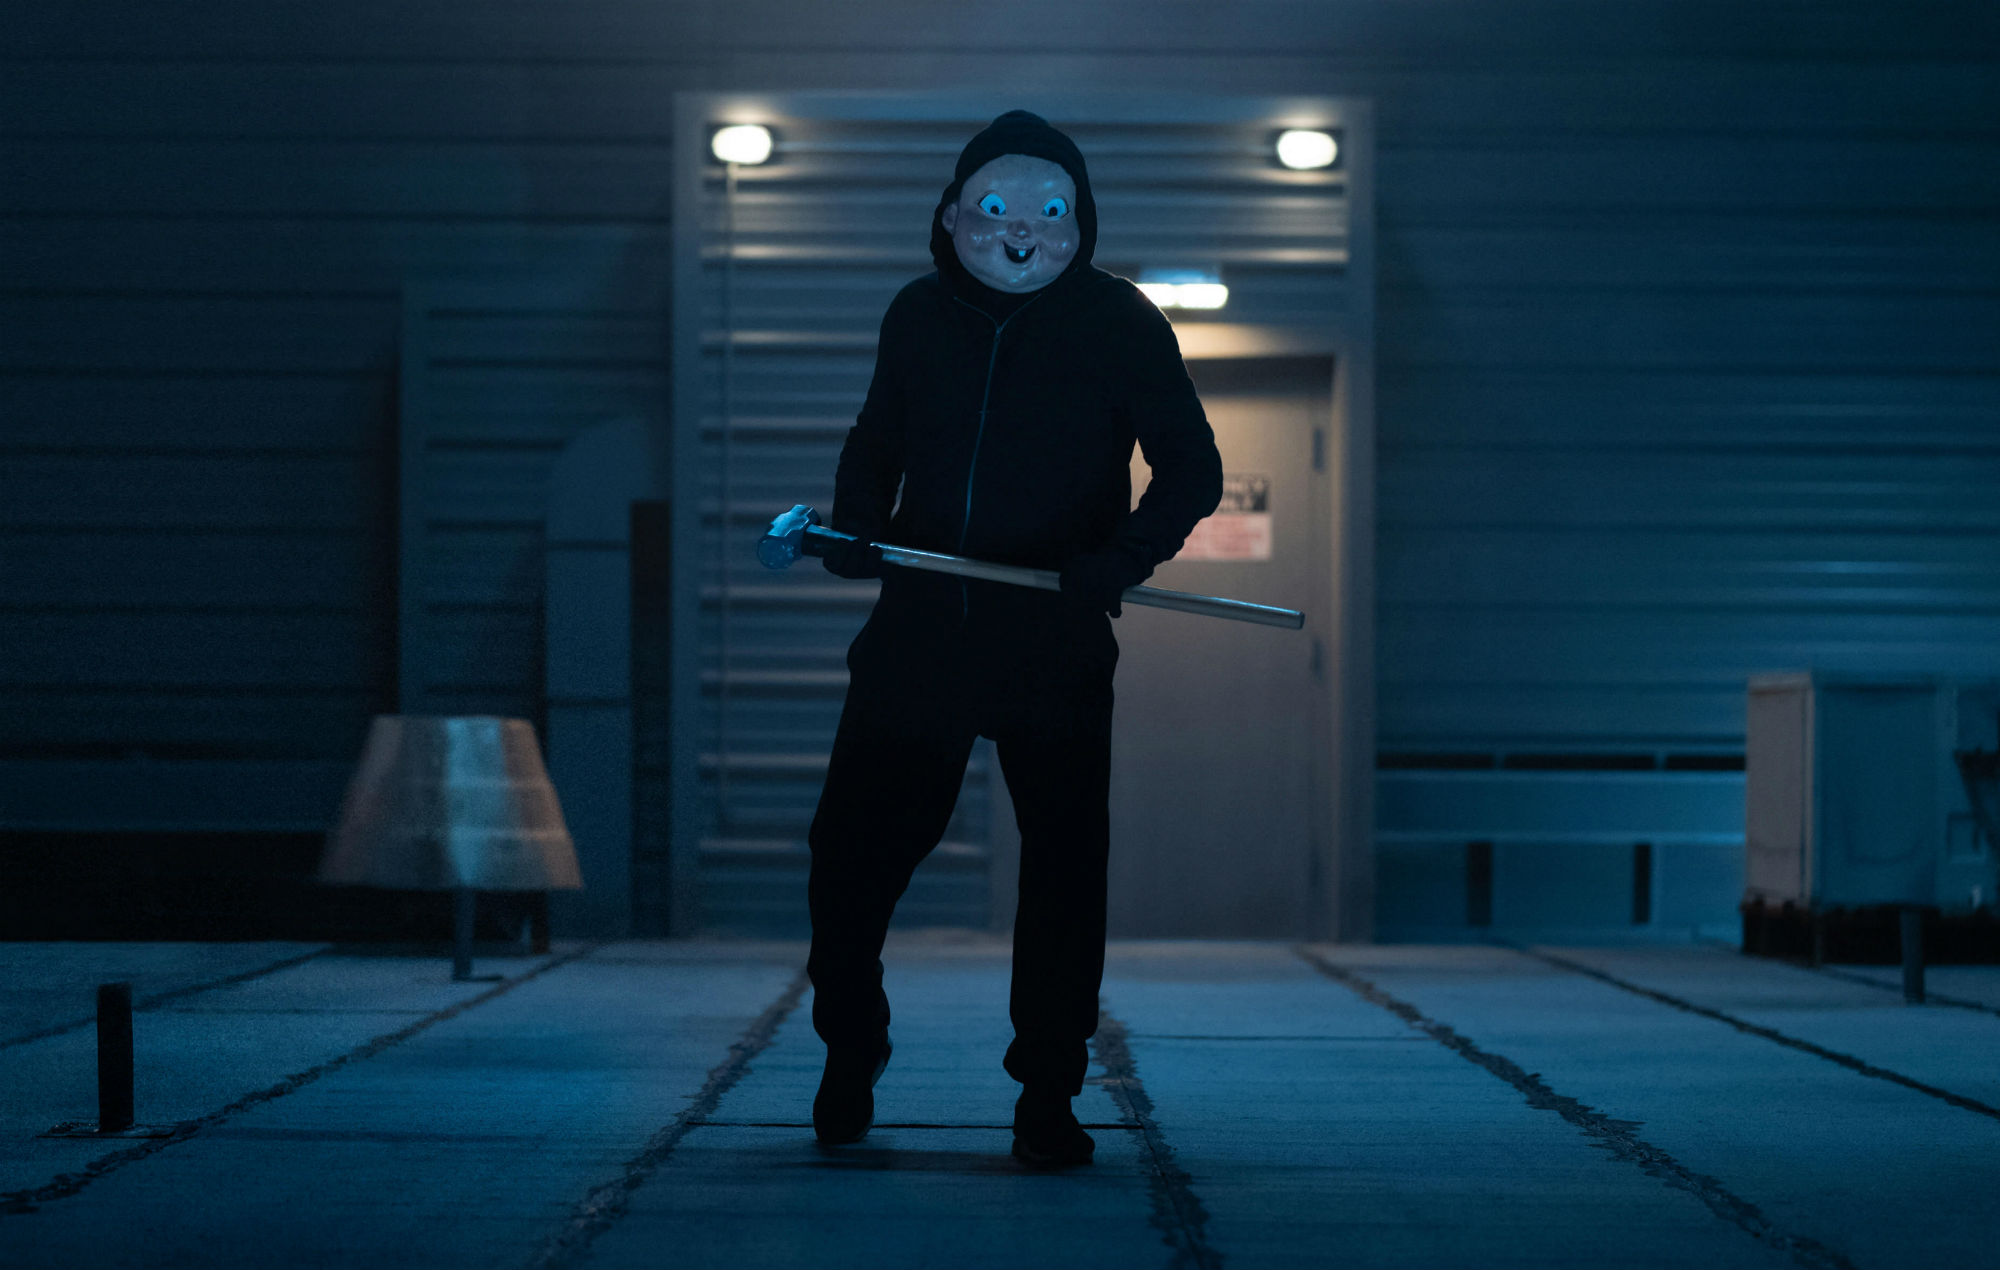 From Jordan Peele to Stephen King: how the horror film resurgence is representing 2019's terrors